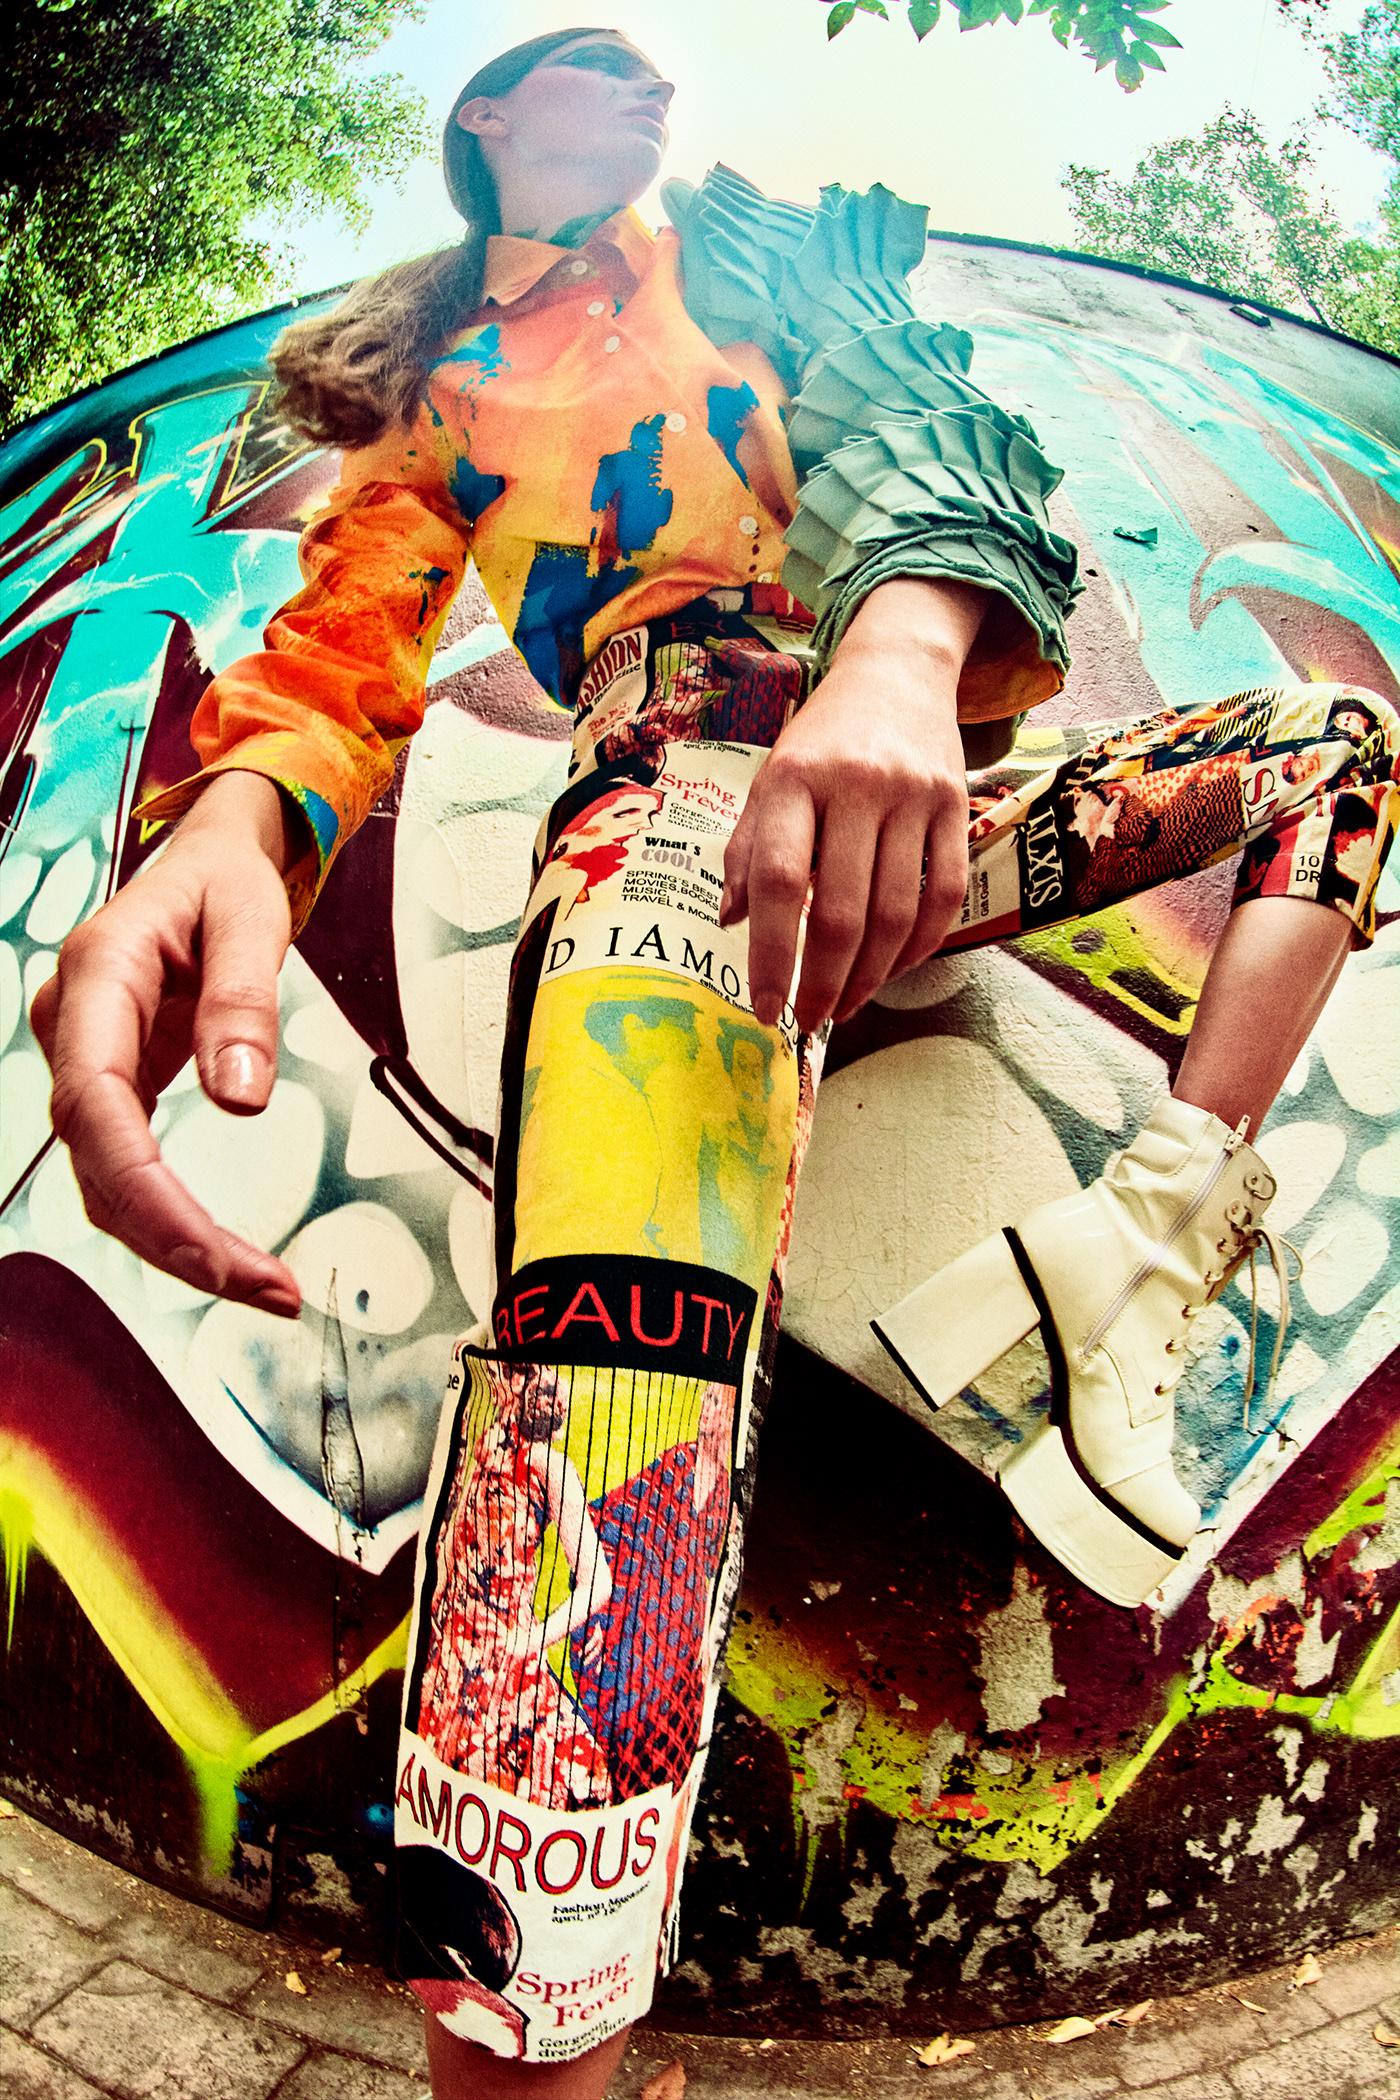 color editorial fashionphotography grafitti mexico model newyork